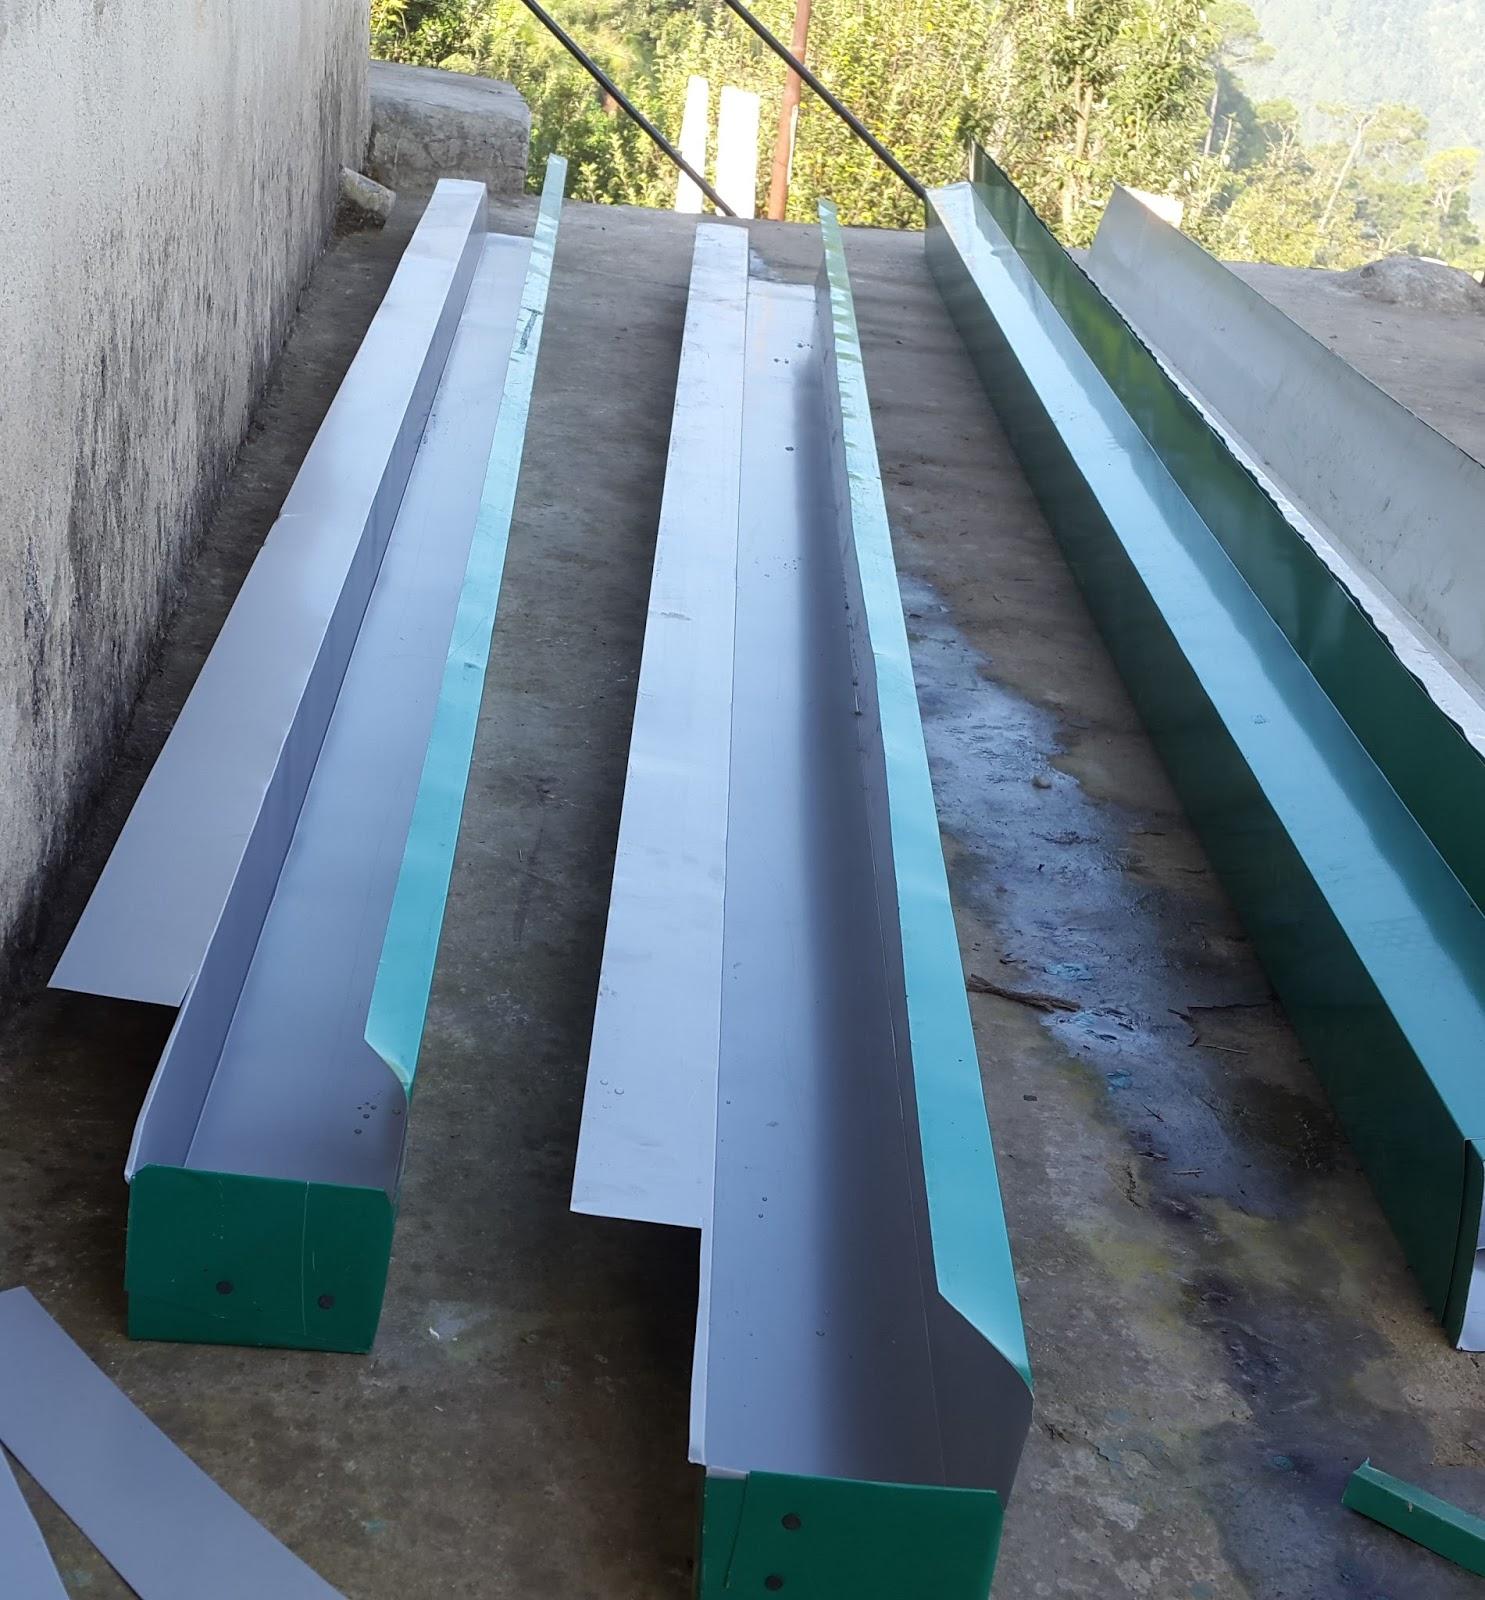 Rainmanspeaks From Bangalore Taping Rainwater On